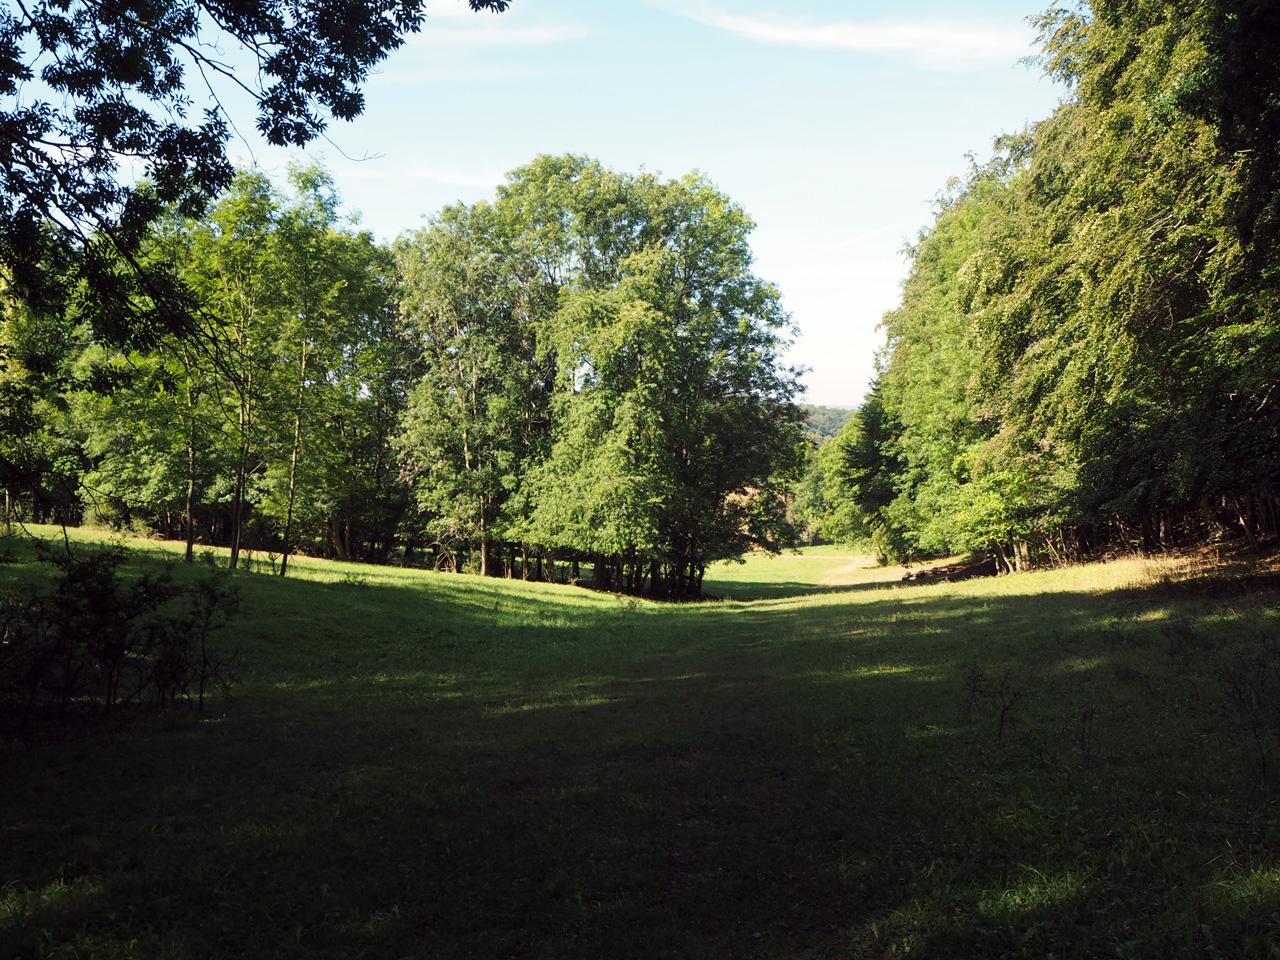 openlucht theater aan de bosrand